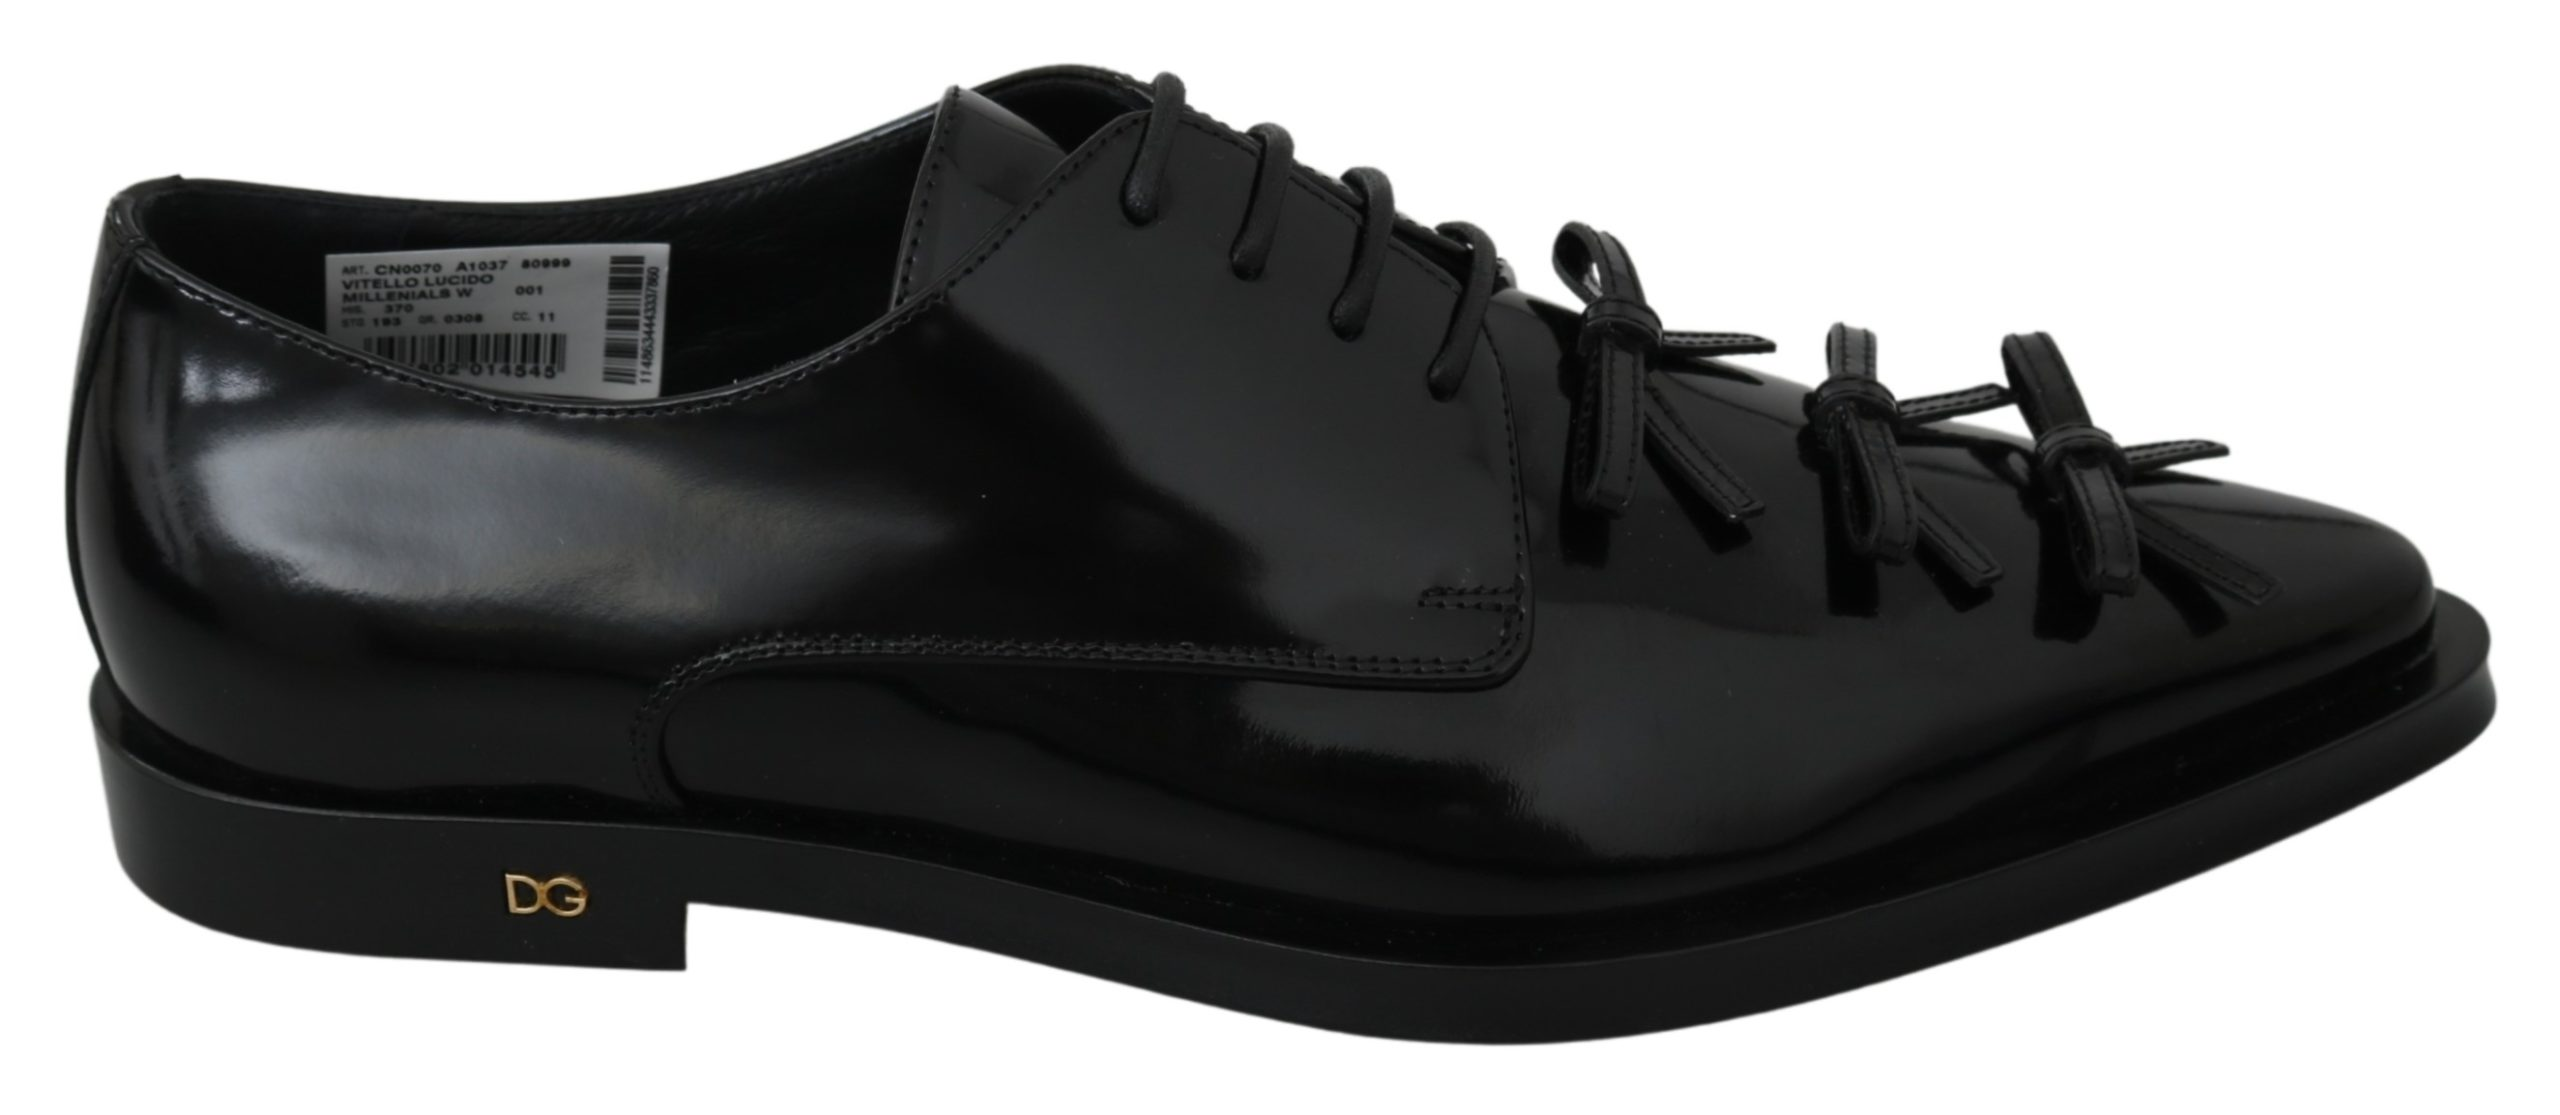 Dolce & Gabbana Women's Leather Formal Lace Up Derby Shoe Black LA7075 - EU39/US8.5